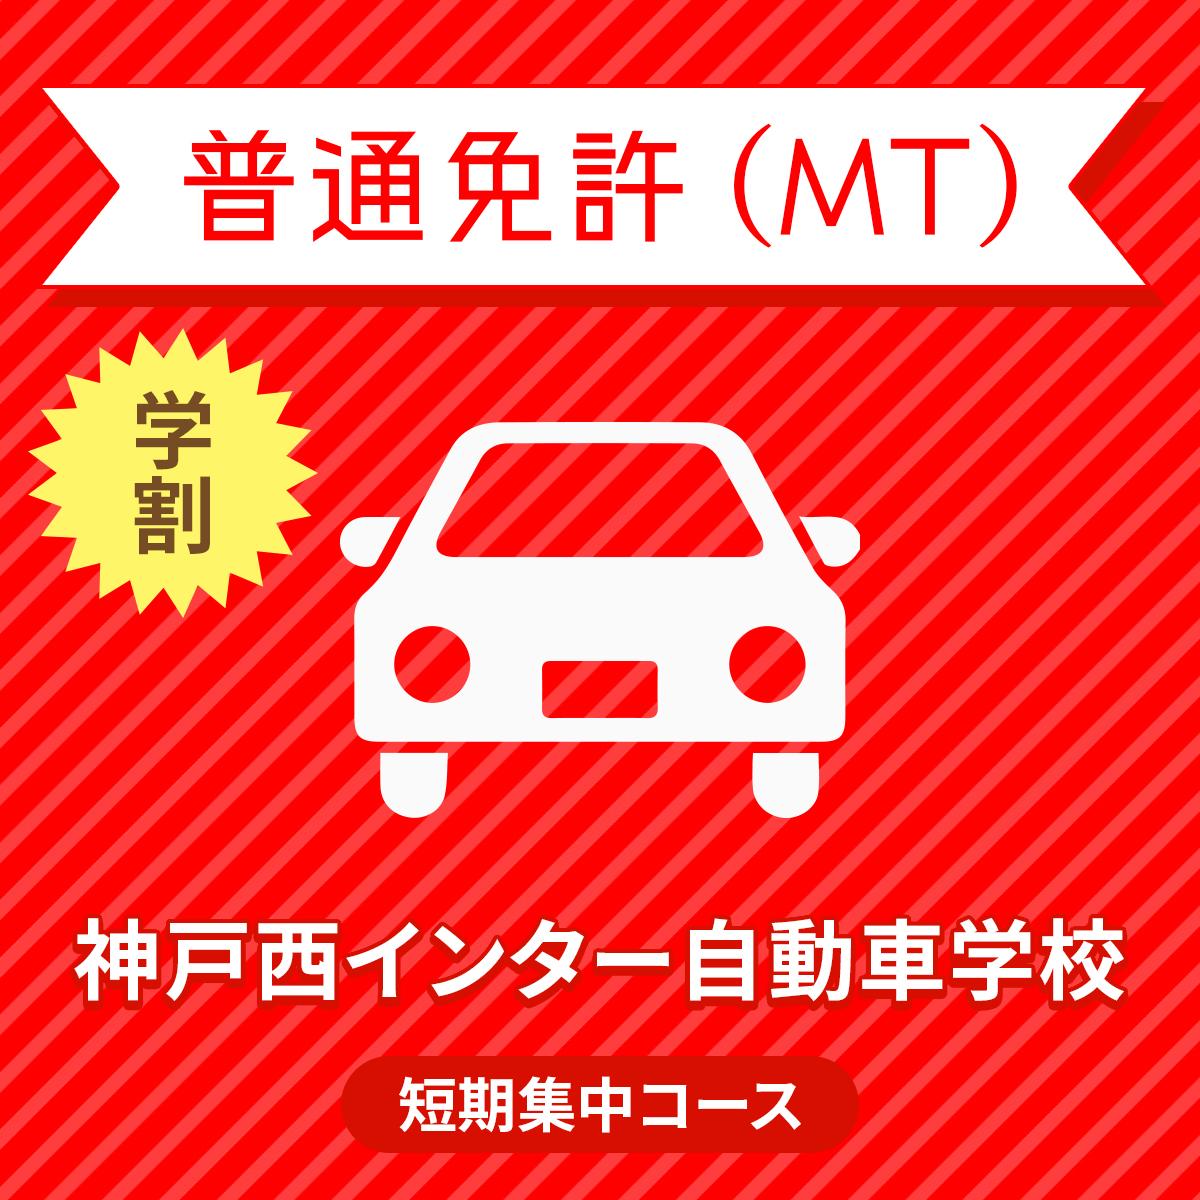 【兵庫県神戸市】普通車MT短期集中コース(学生料金)<免許なし/原付免許所持対象>